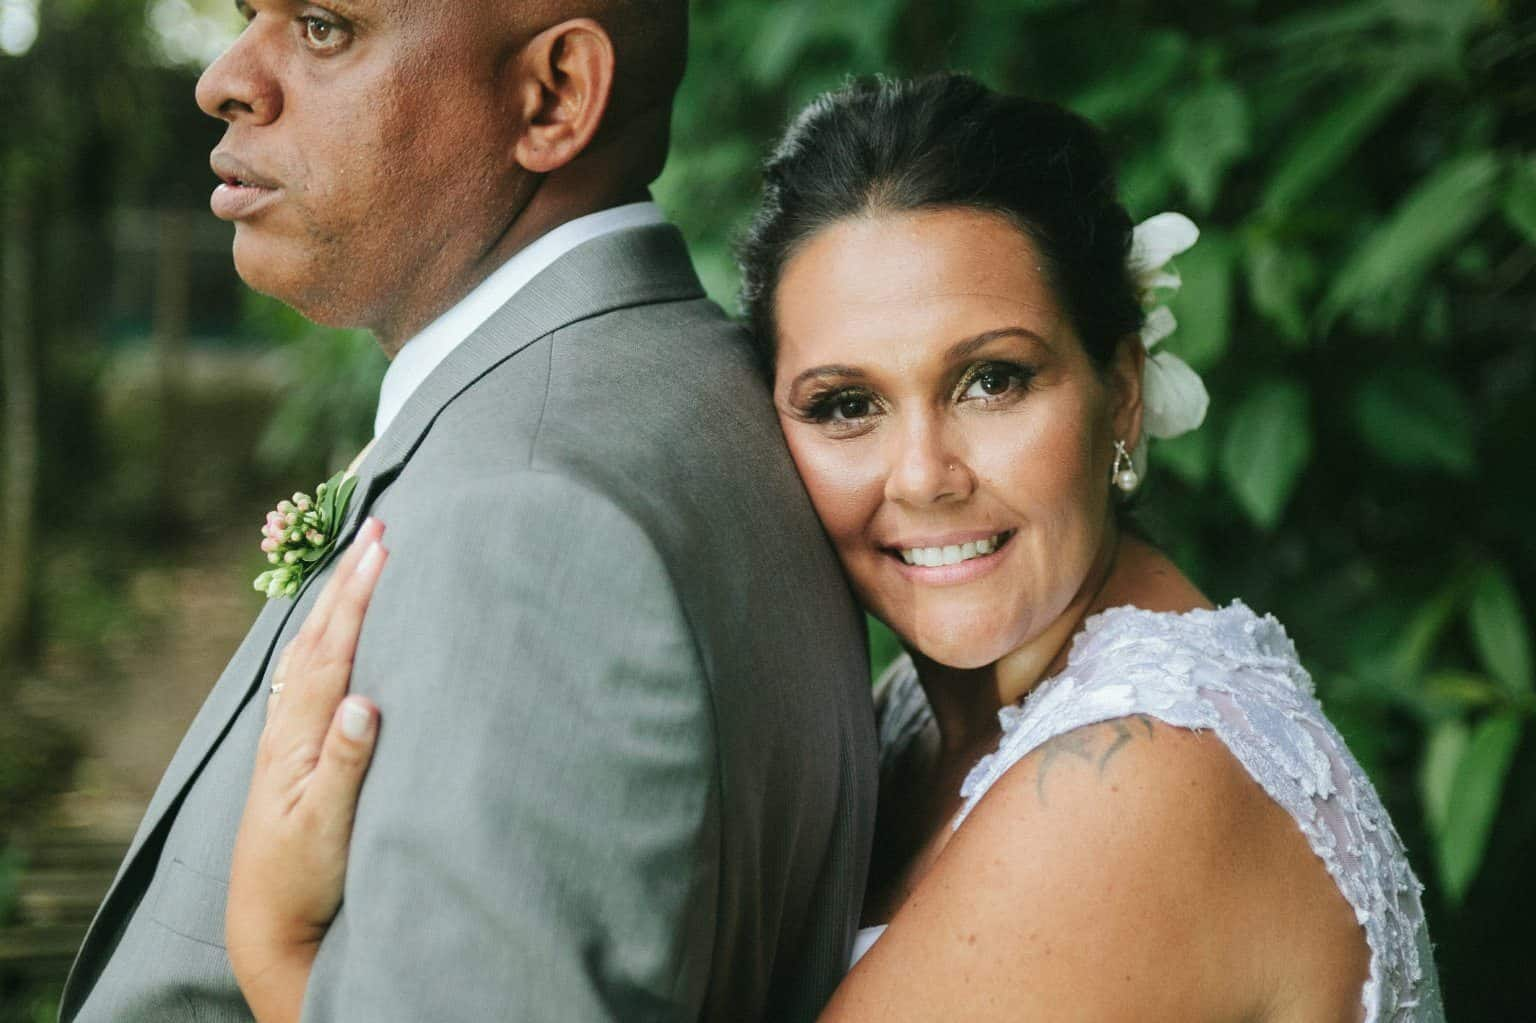 casamento-karina-e-marcos-felizes-para-sempre-caseme-10